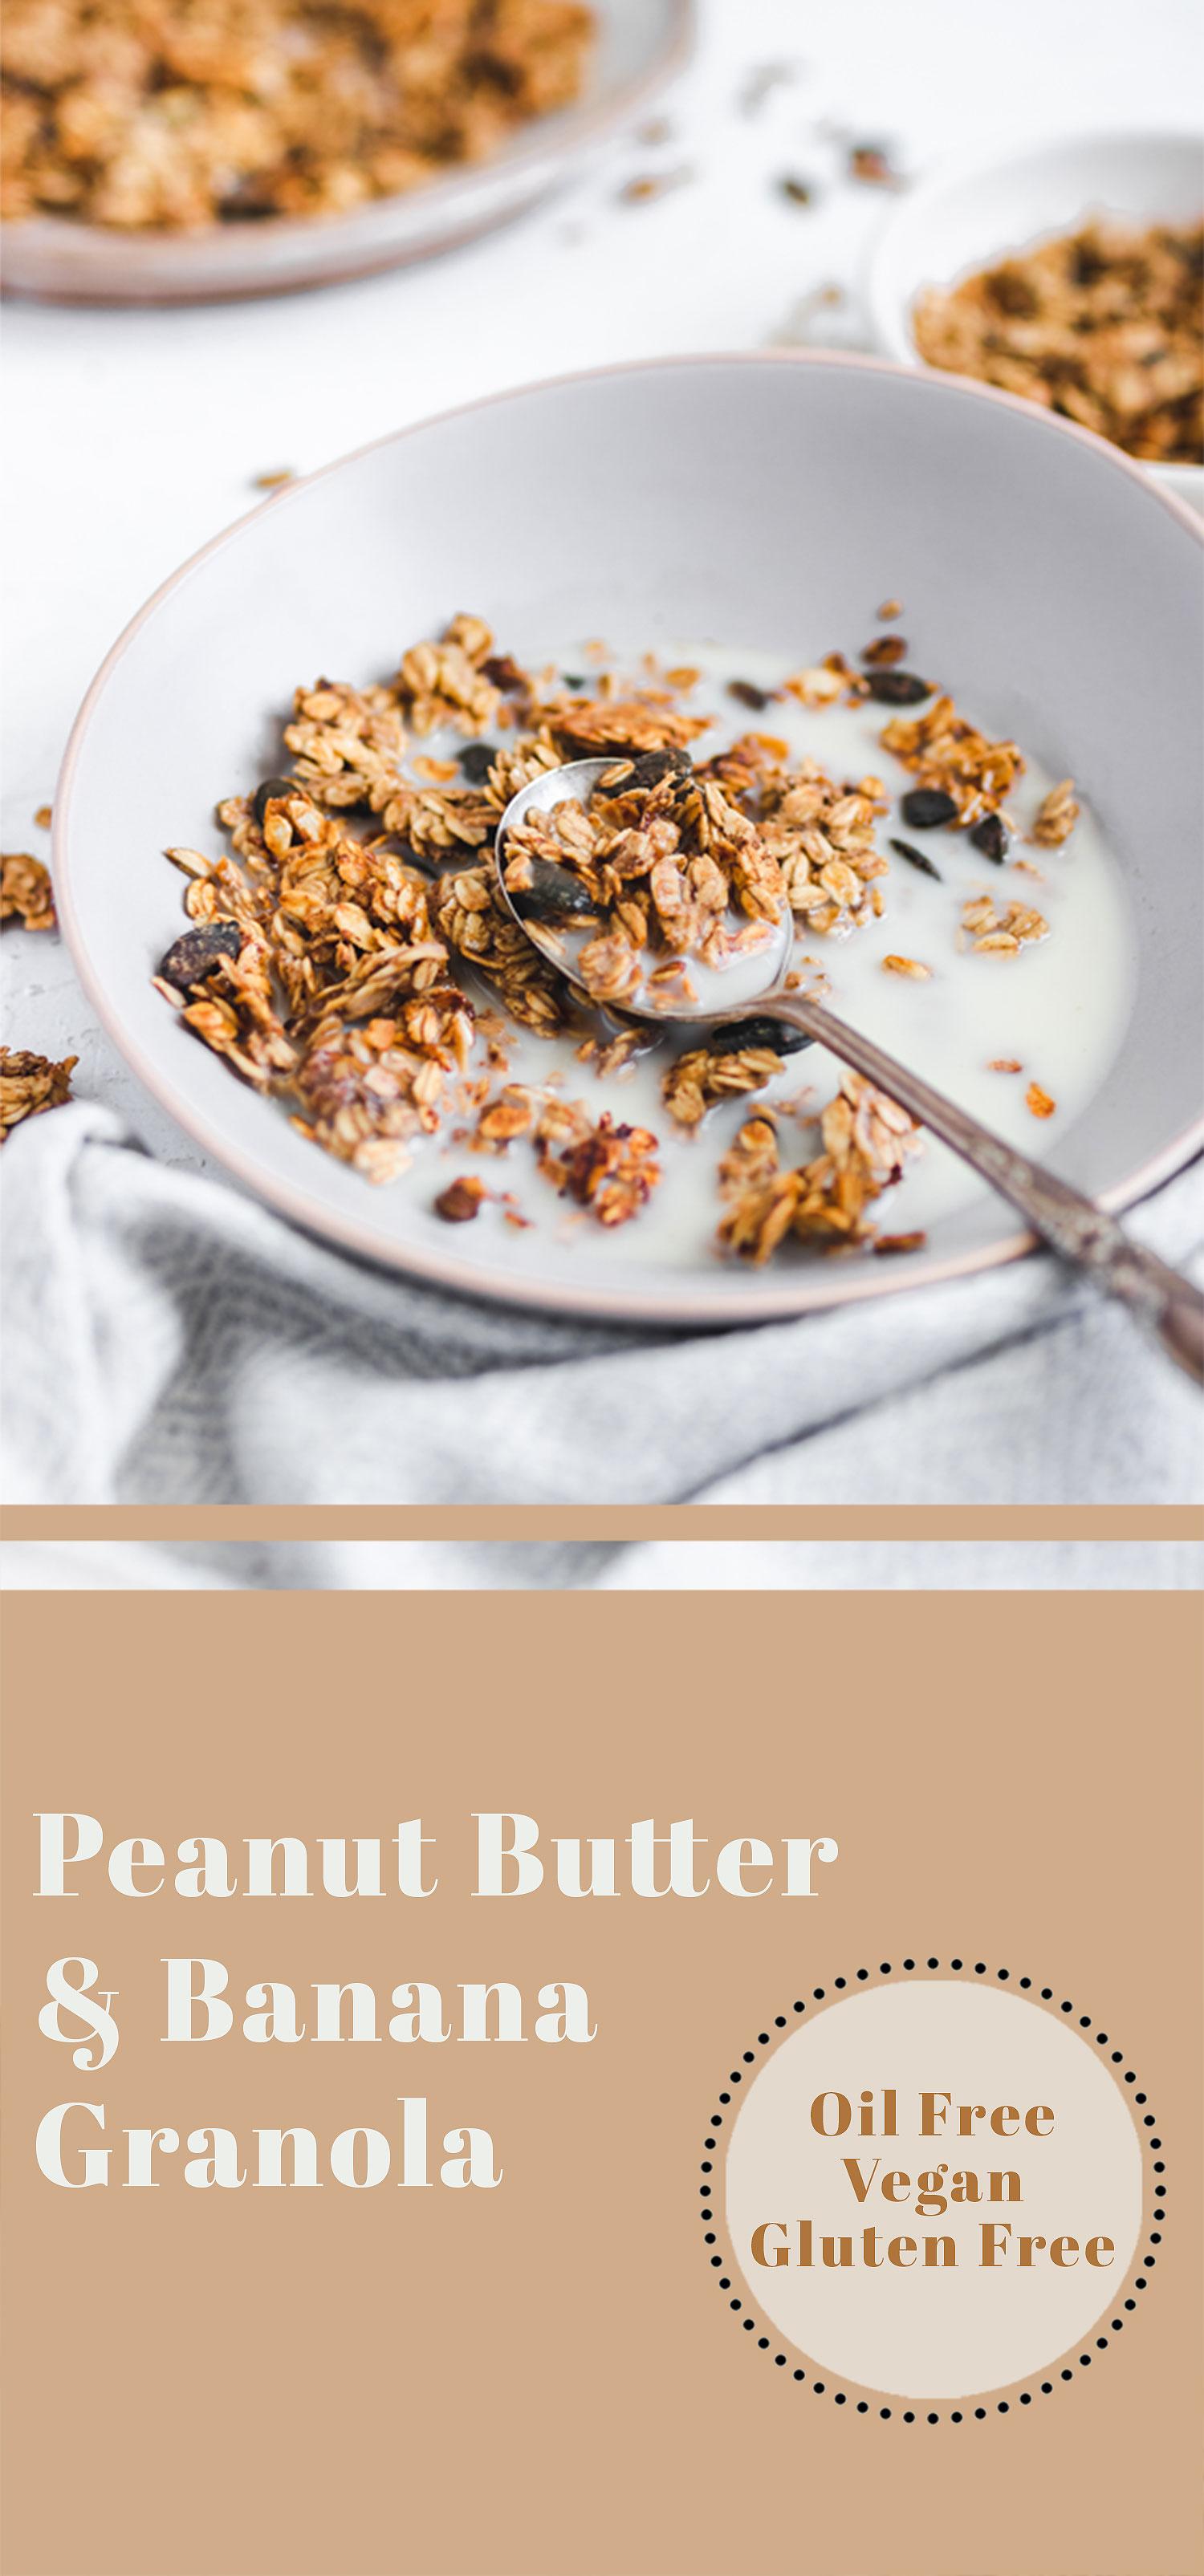 Oil Free Peanut Butter & Banana Granola